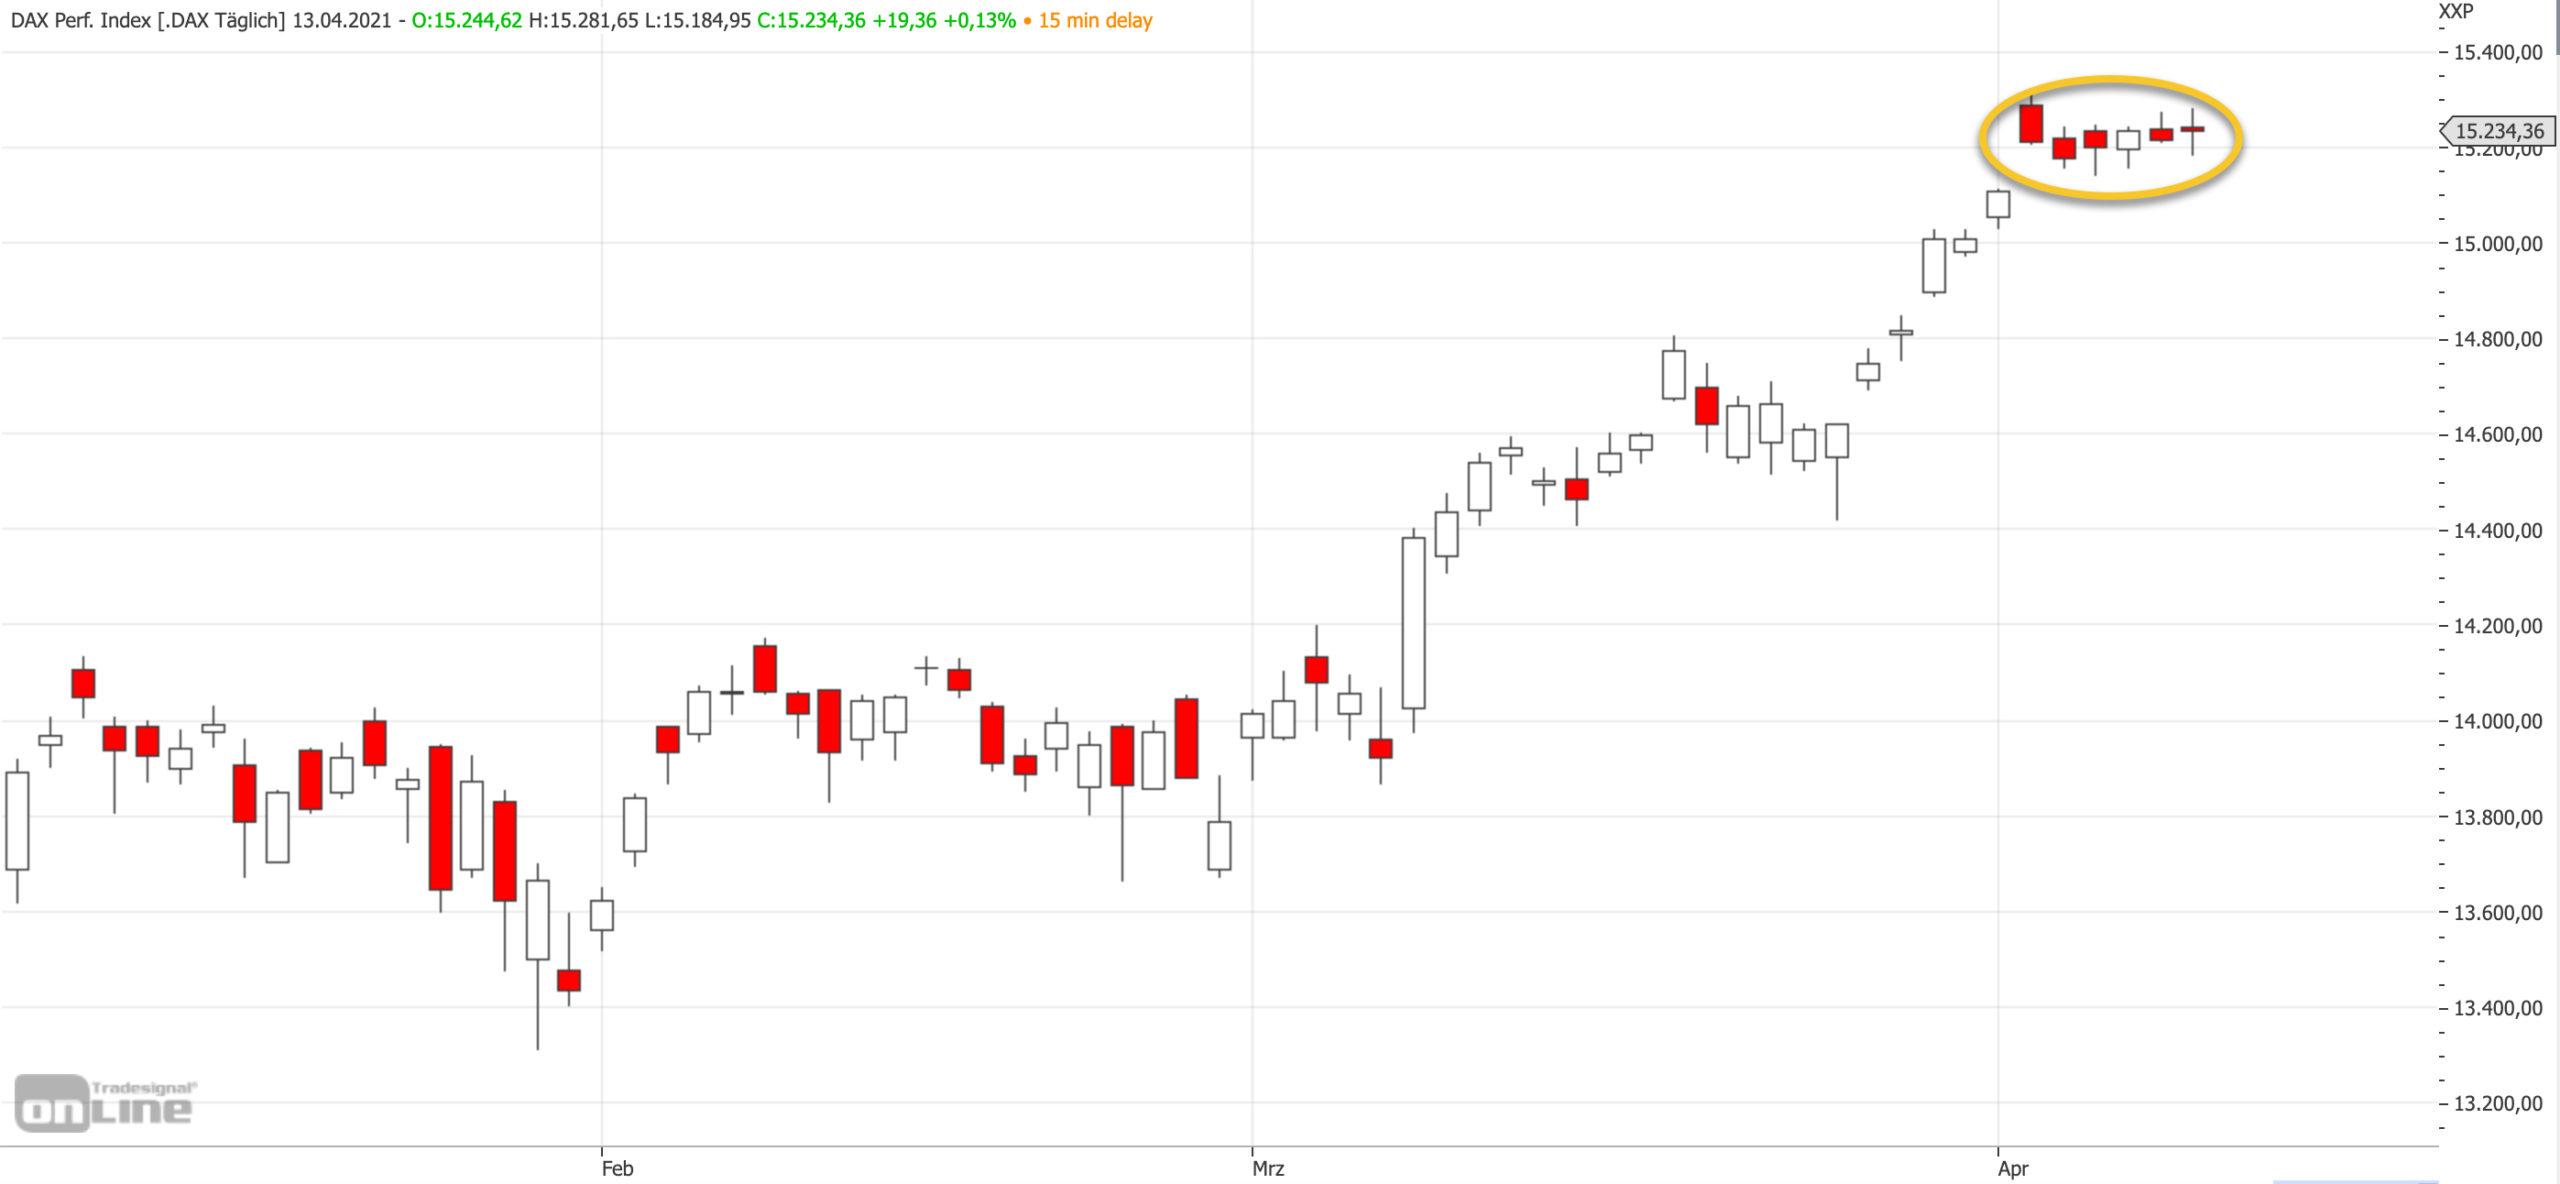 Mittelfristiger DAX-Chart am 13.04.2021